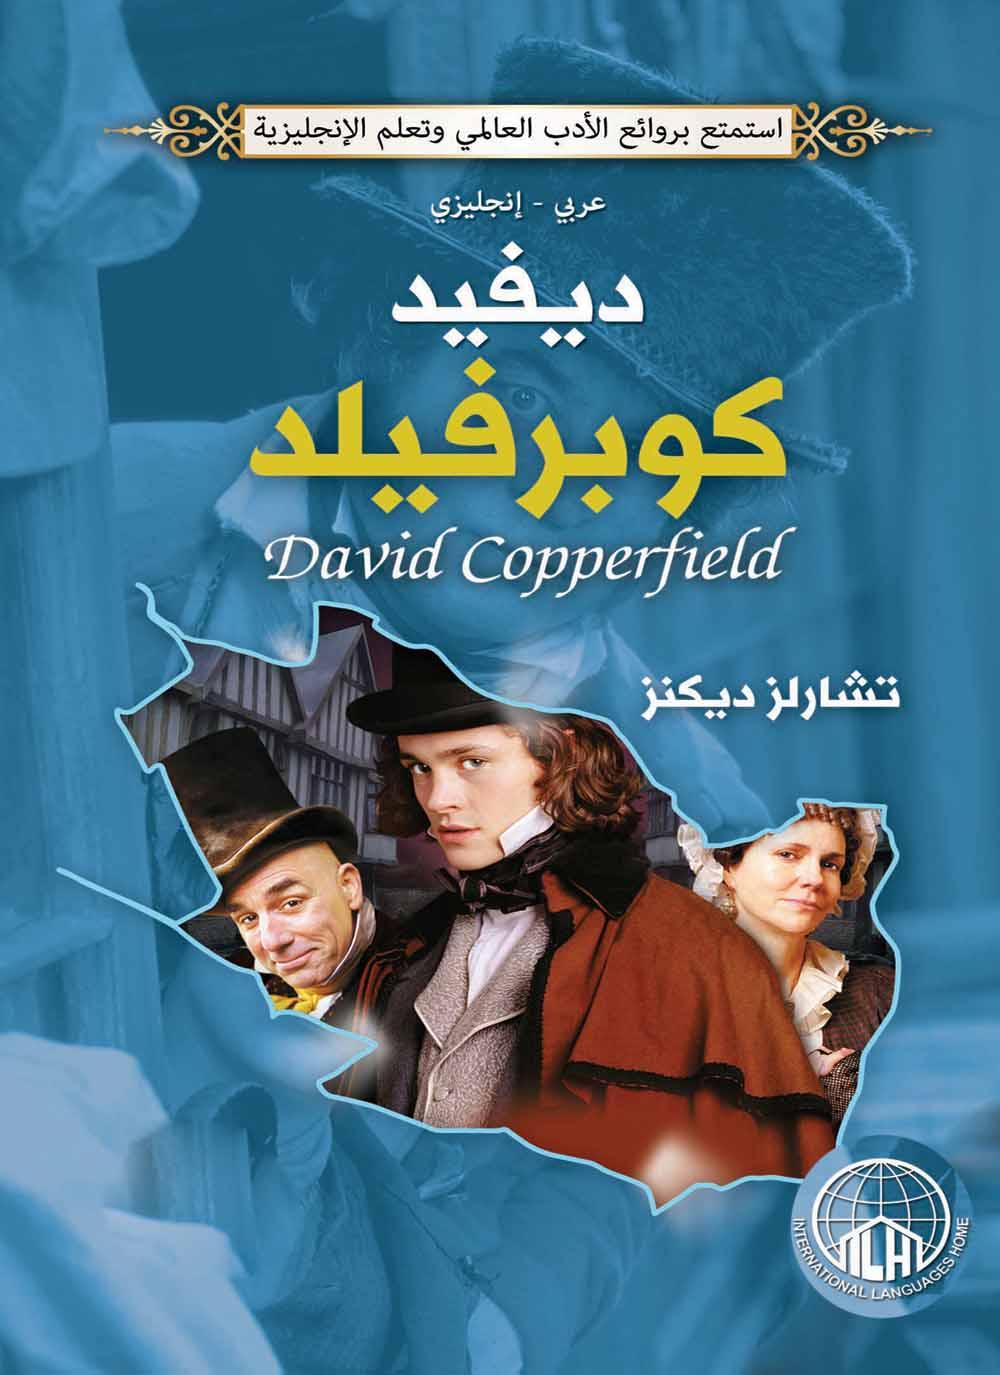 Photo of تحميل كتاب دافيد كوبرفيلد PDF